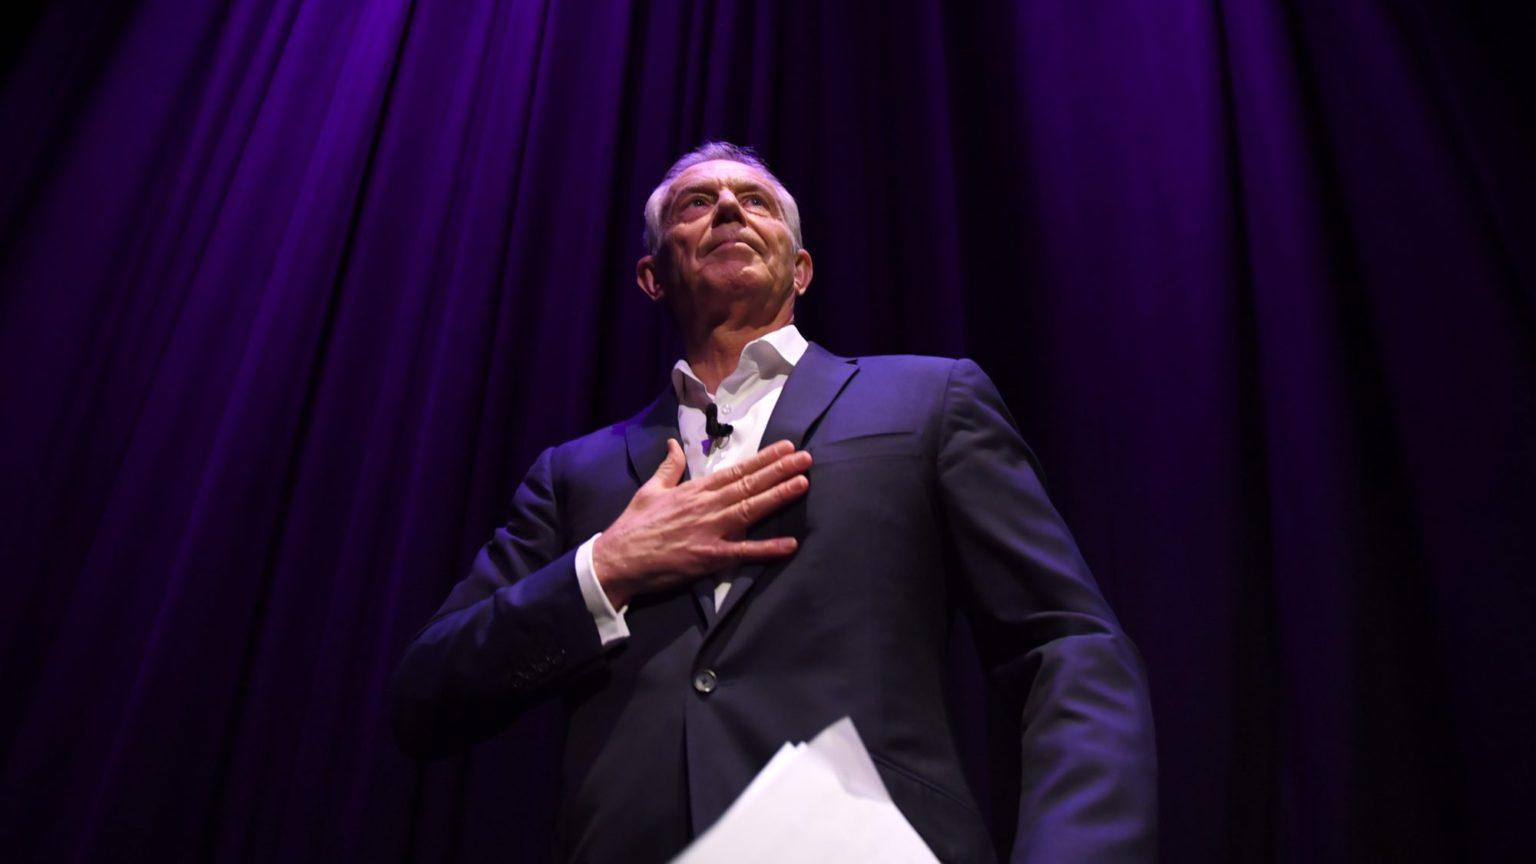 Why won't Tony Blair leave us alone?